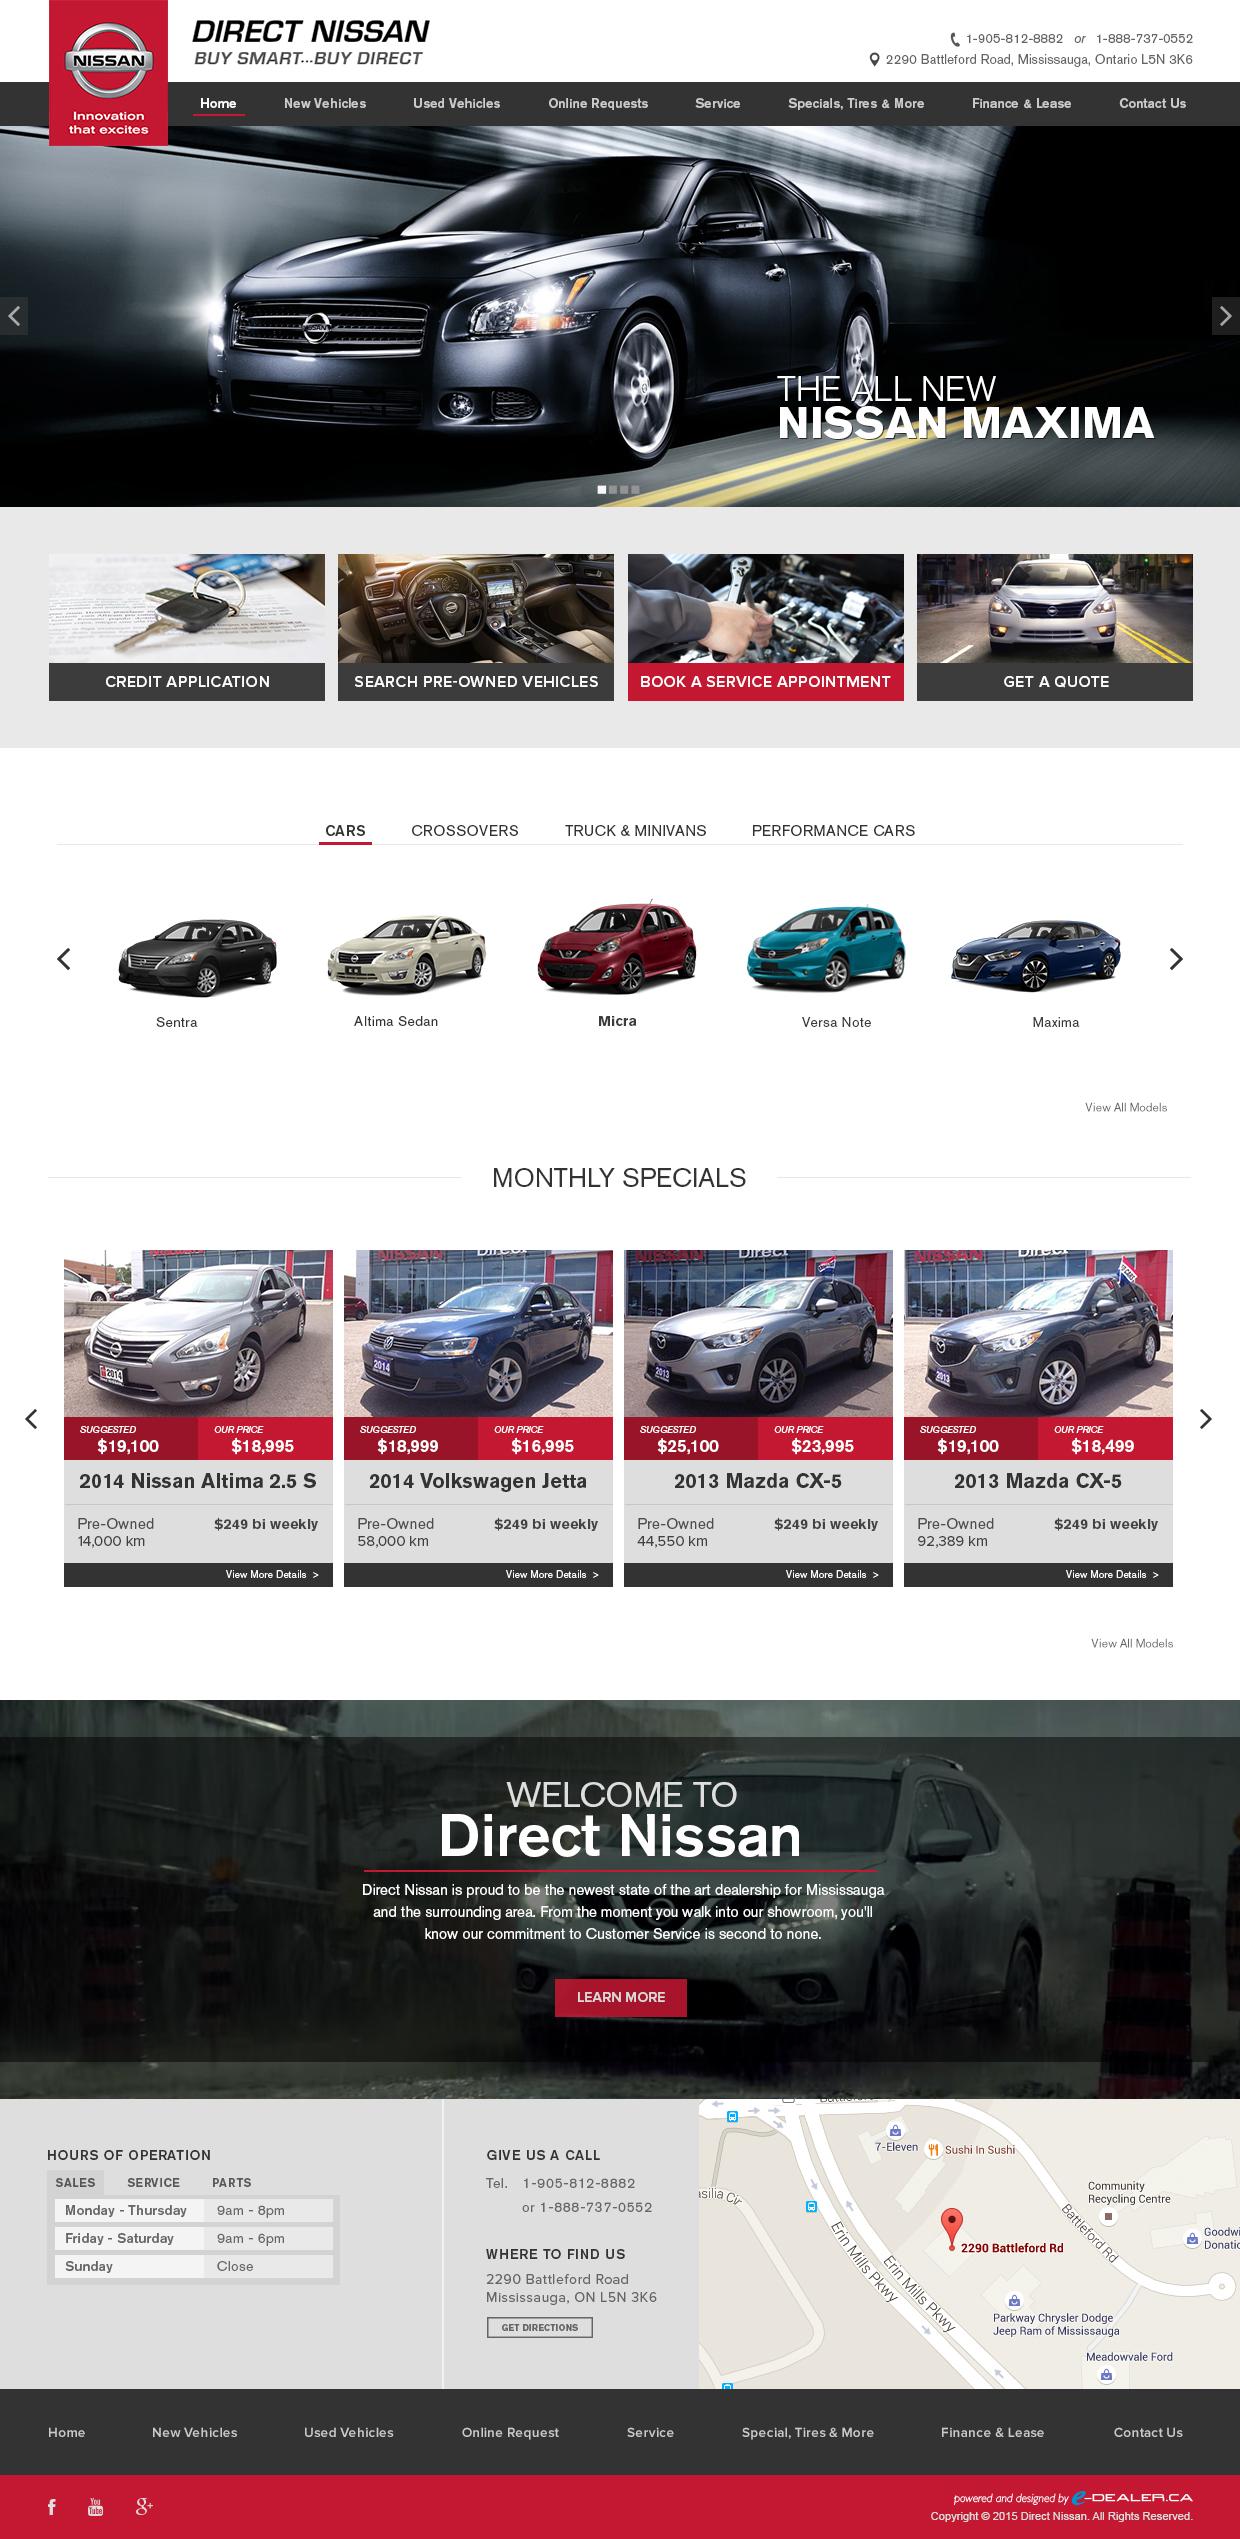 DirectNissan-DesktopDesign